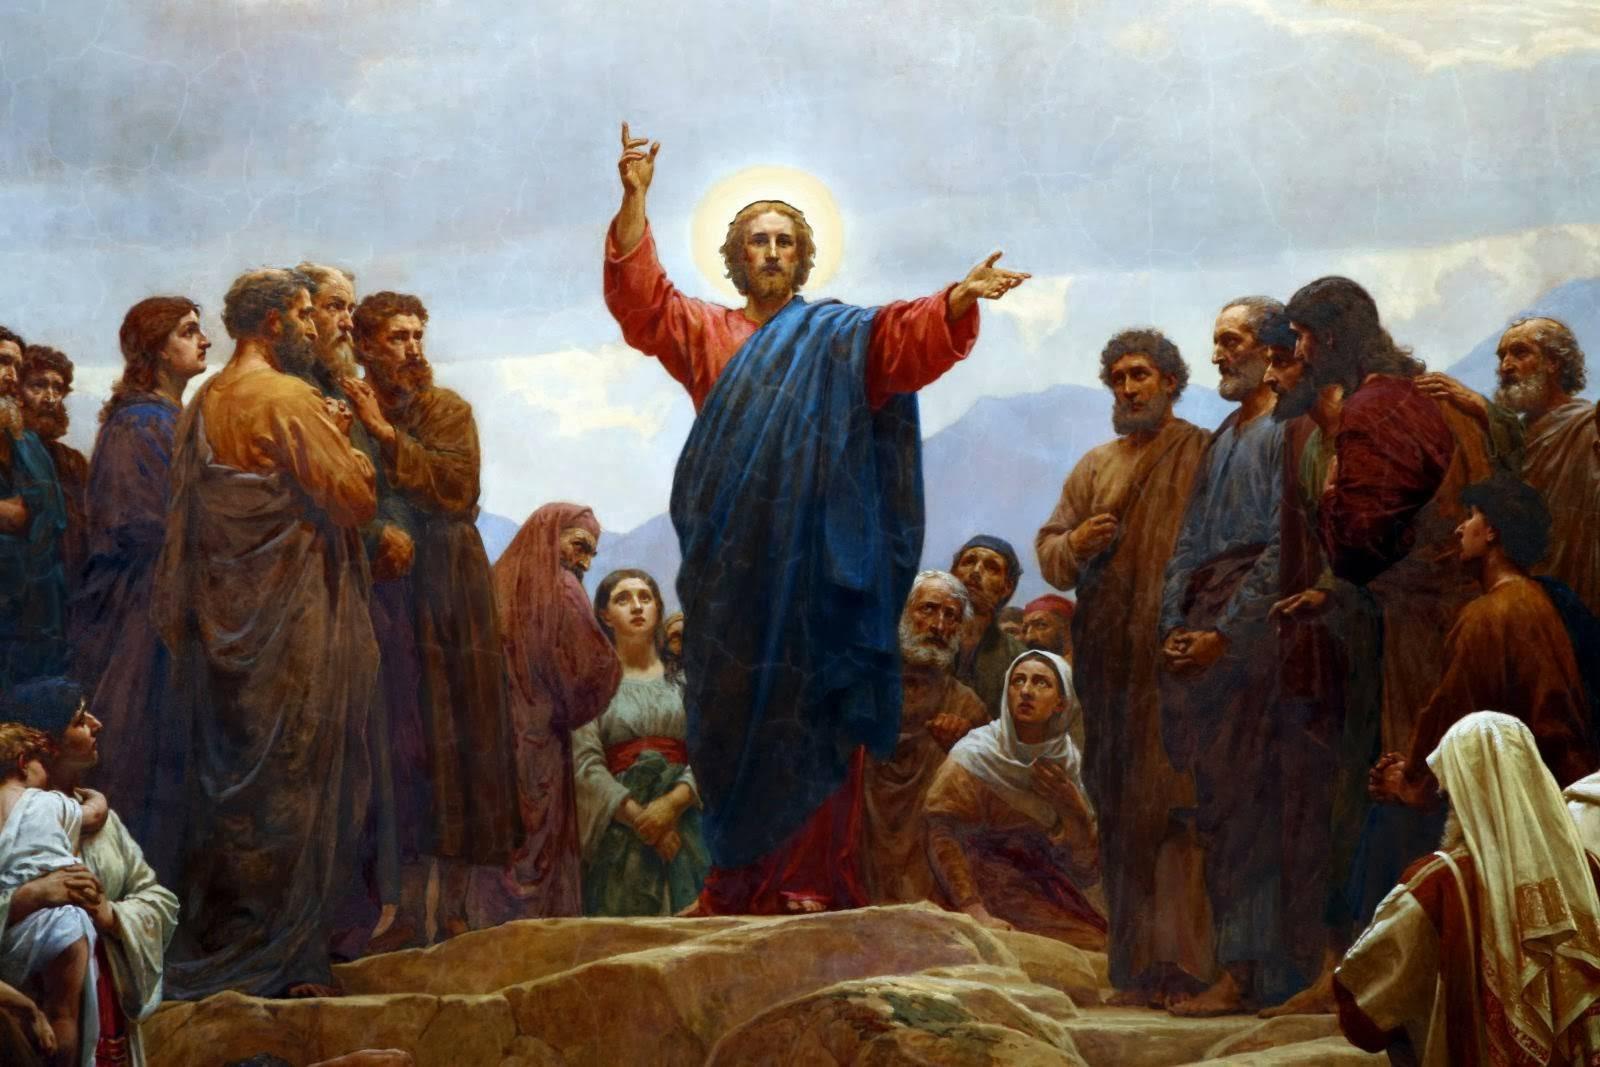 Evangelio según San Lucas 10,21-24.